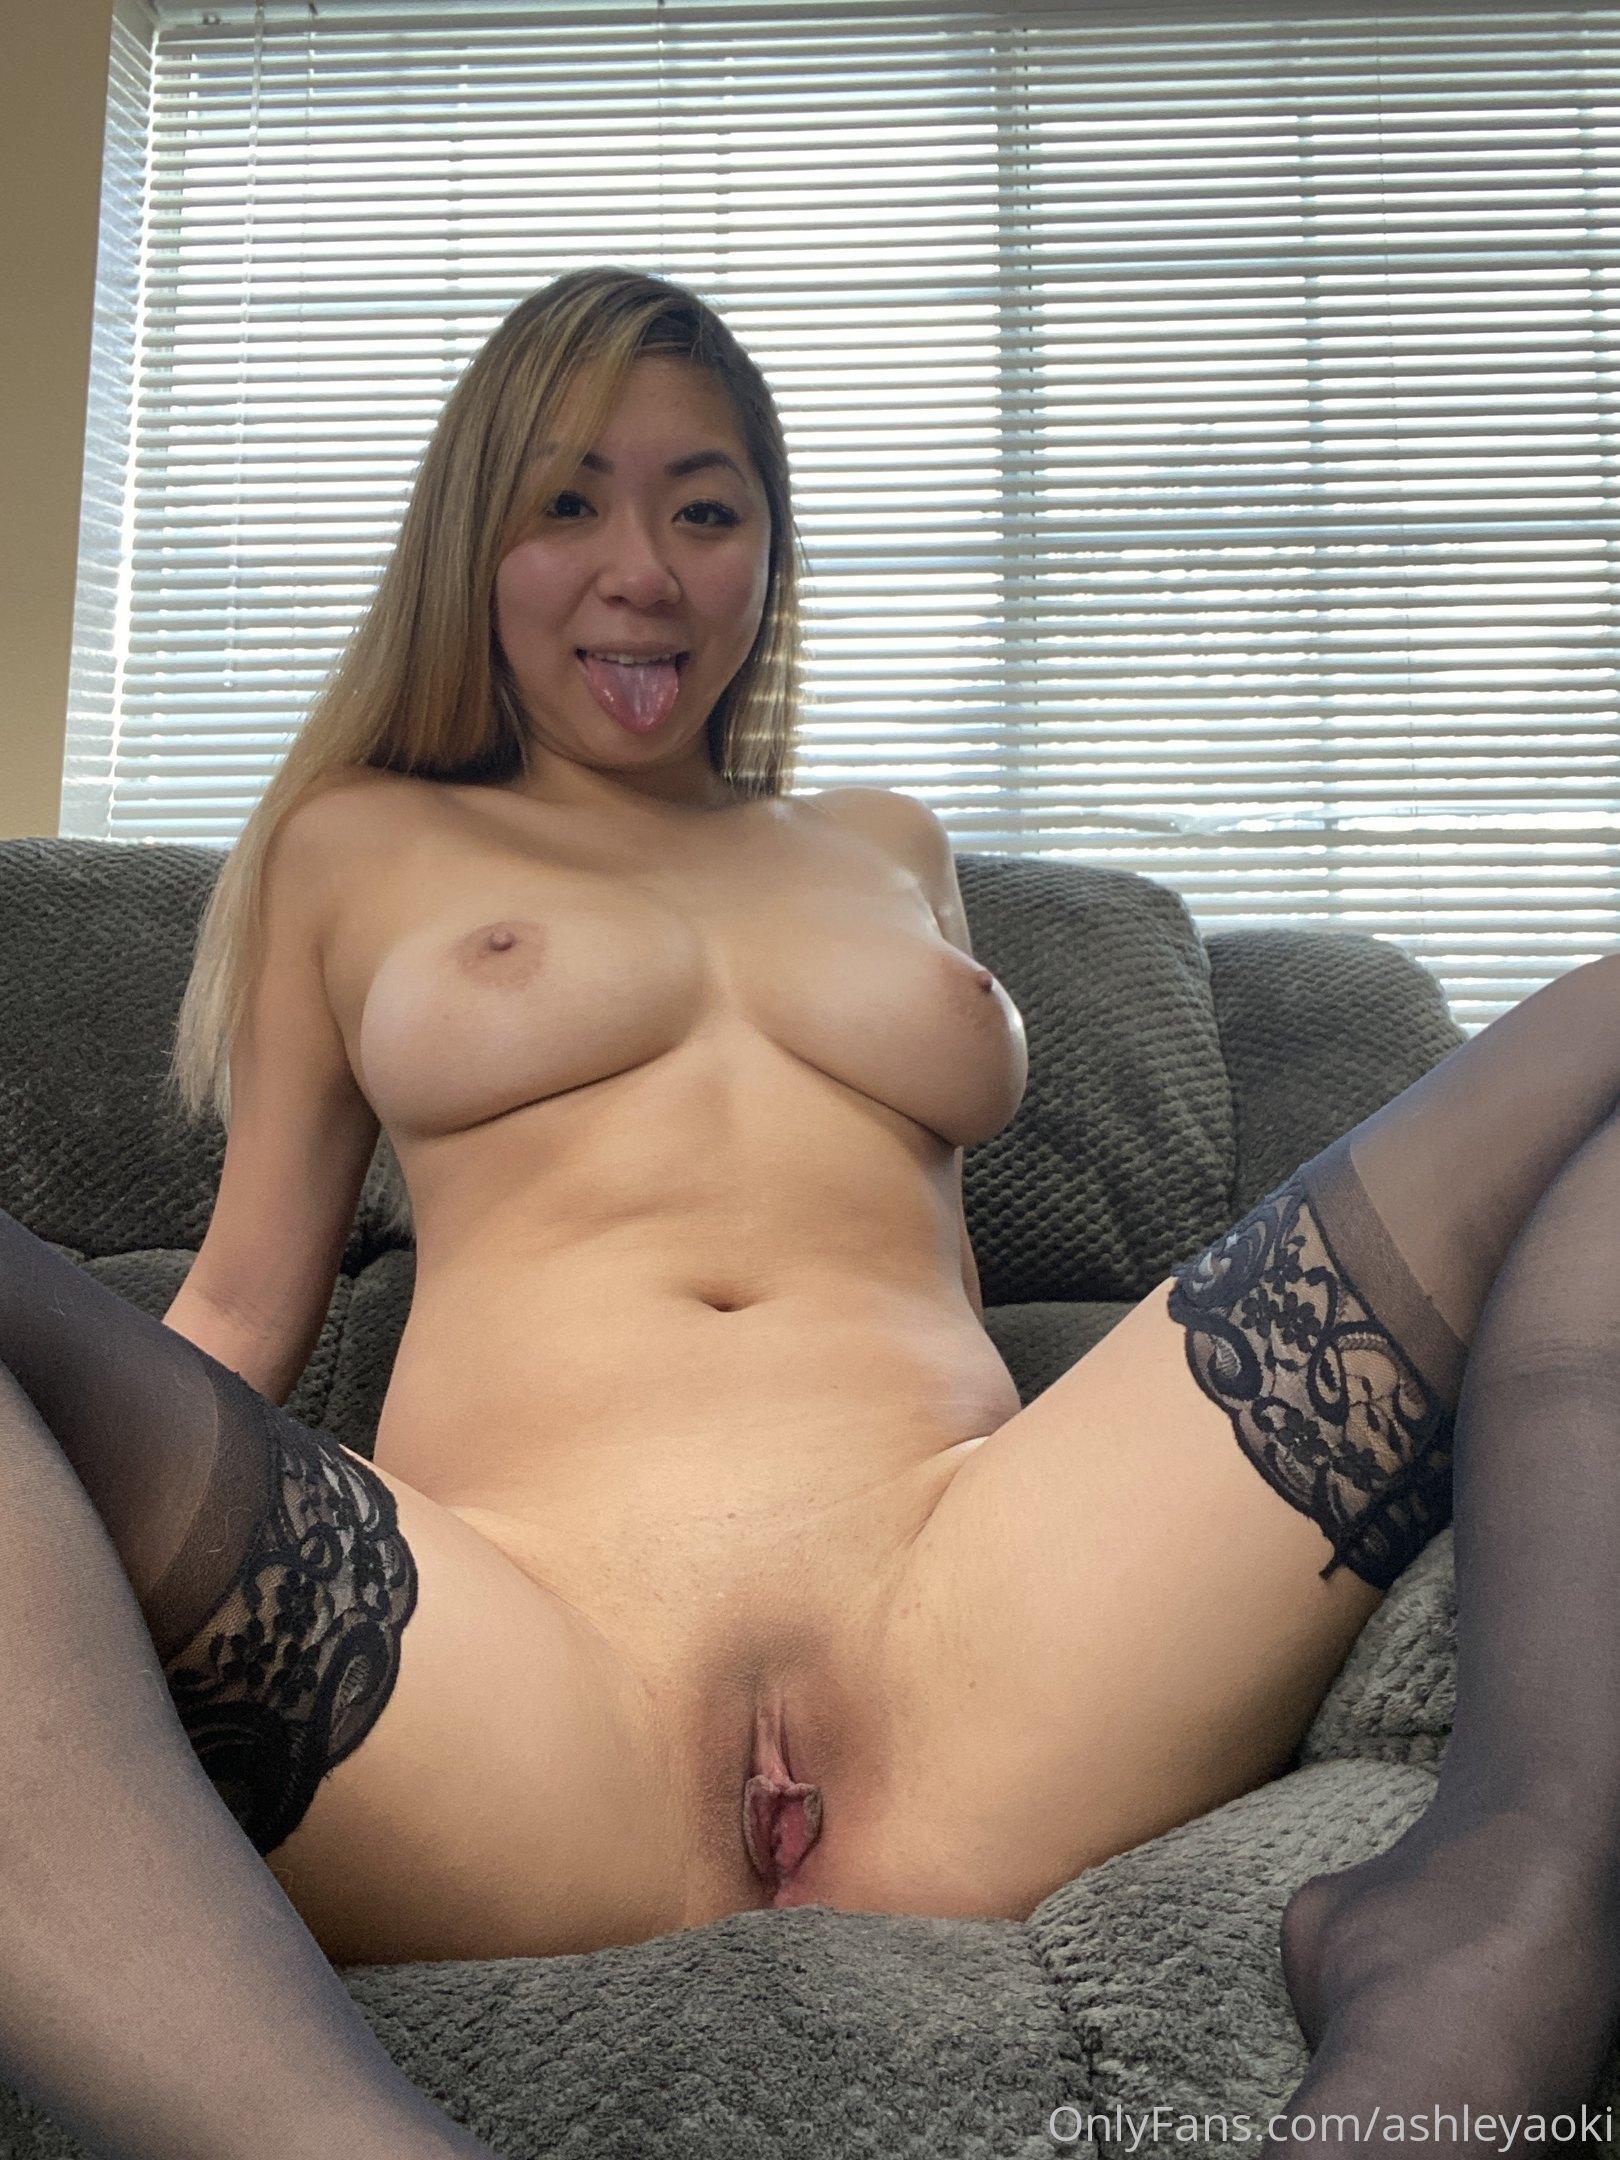 Ashley Aoki, Ashleyaoki, Onlyfans Leaks 0149